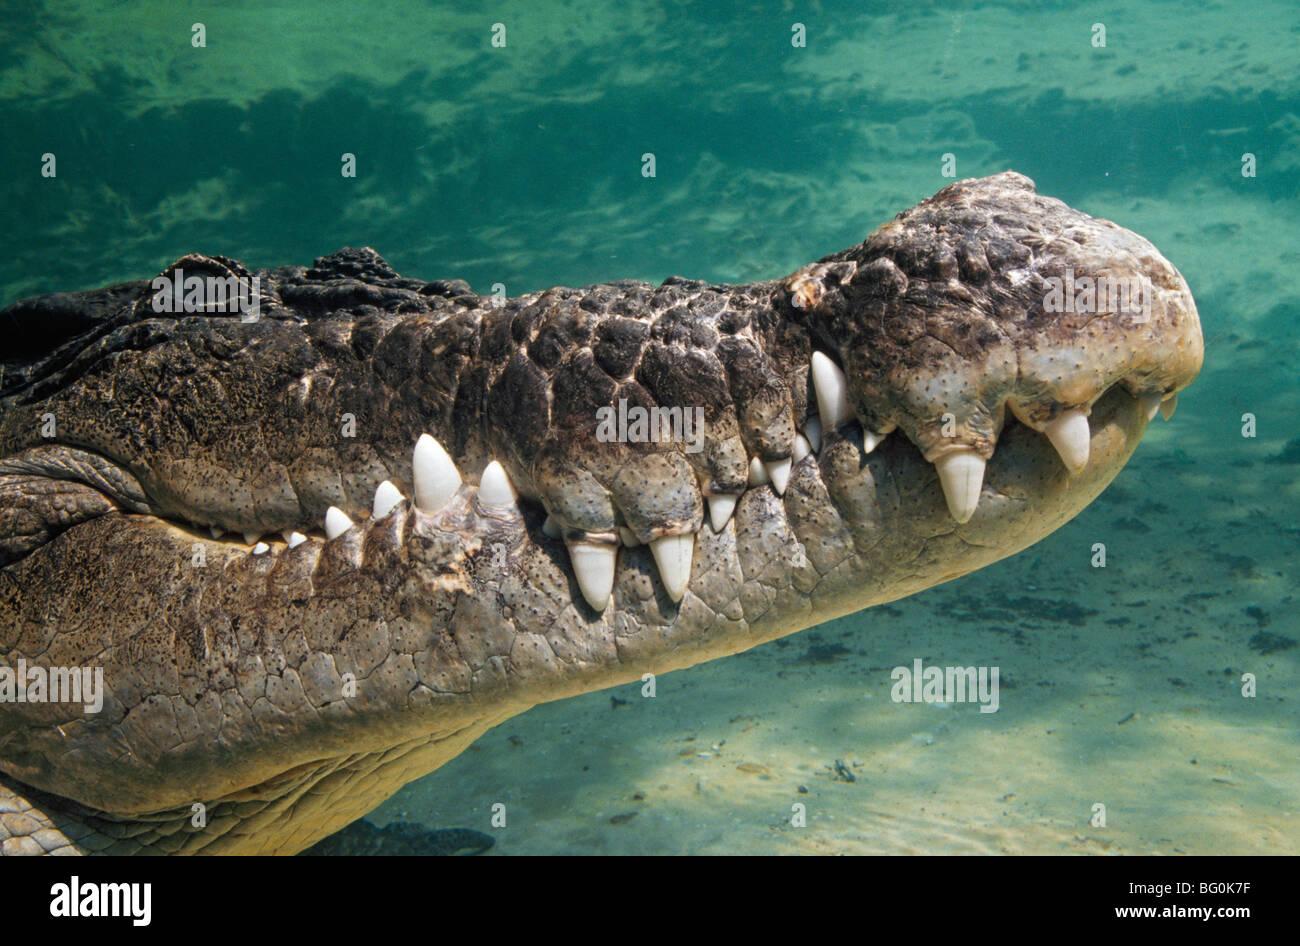 Close-up of saltwater crocodile underwater - Stock Image